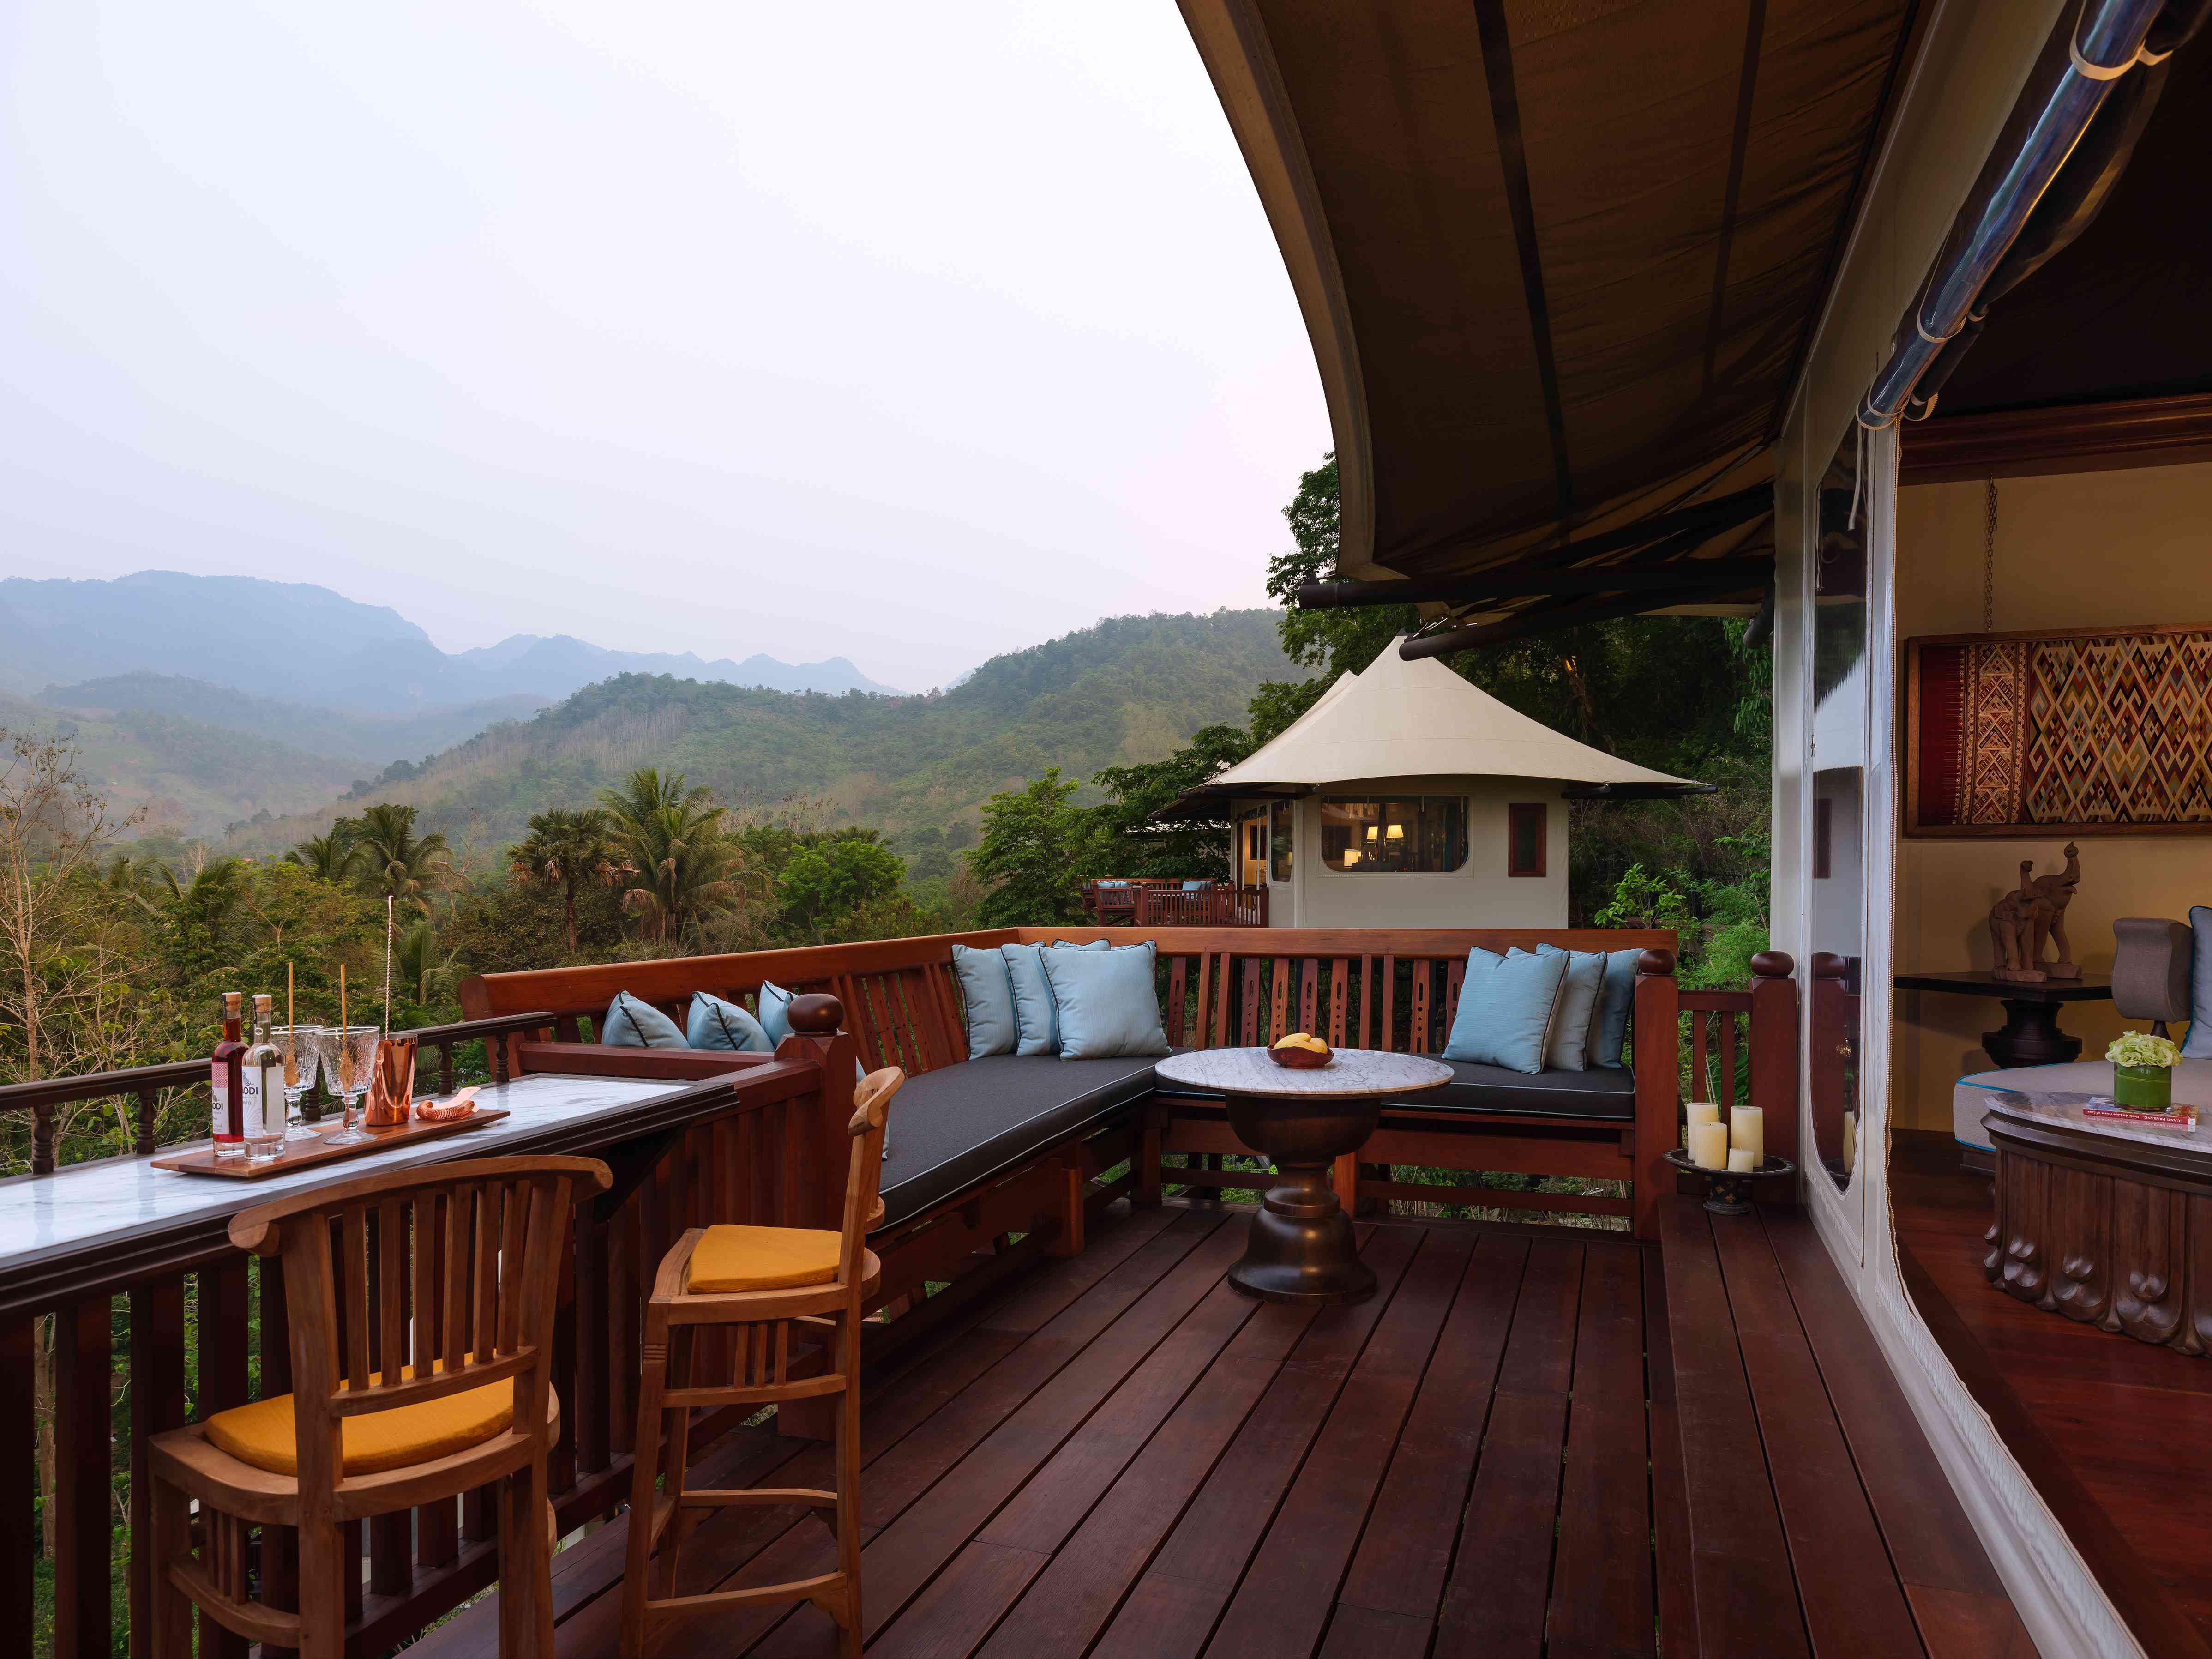 Deck at Rosewood Luang Prabang